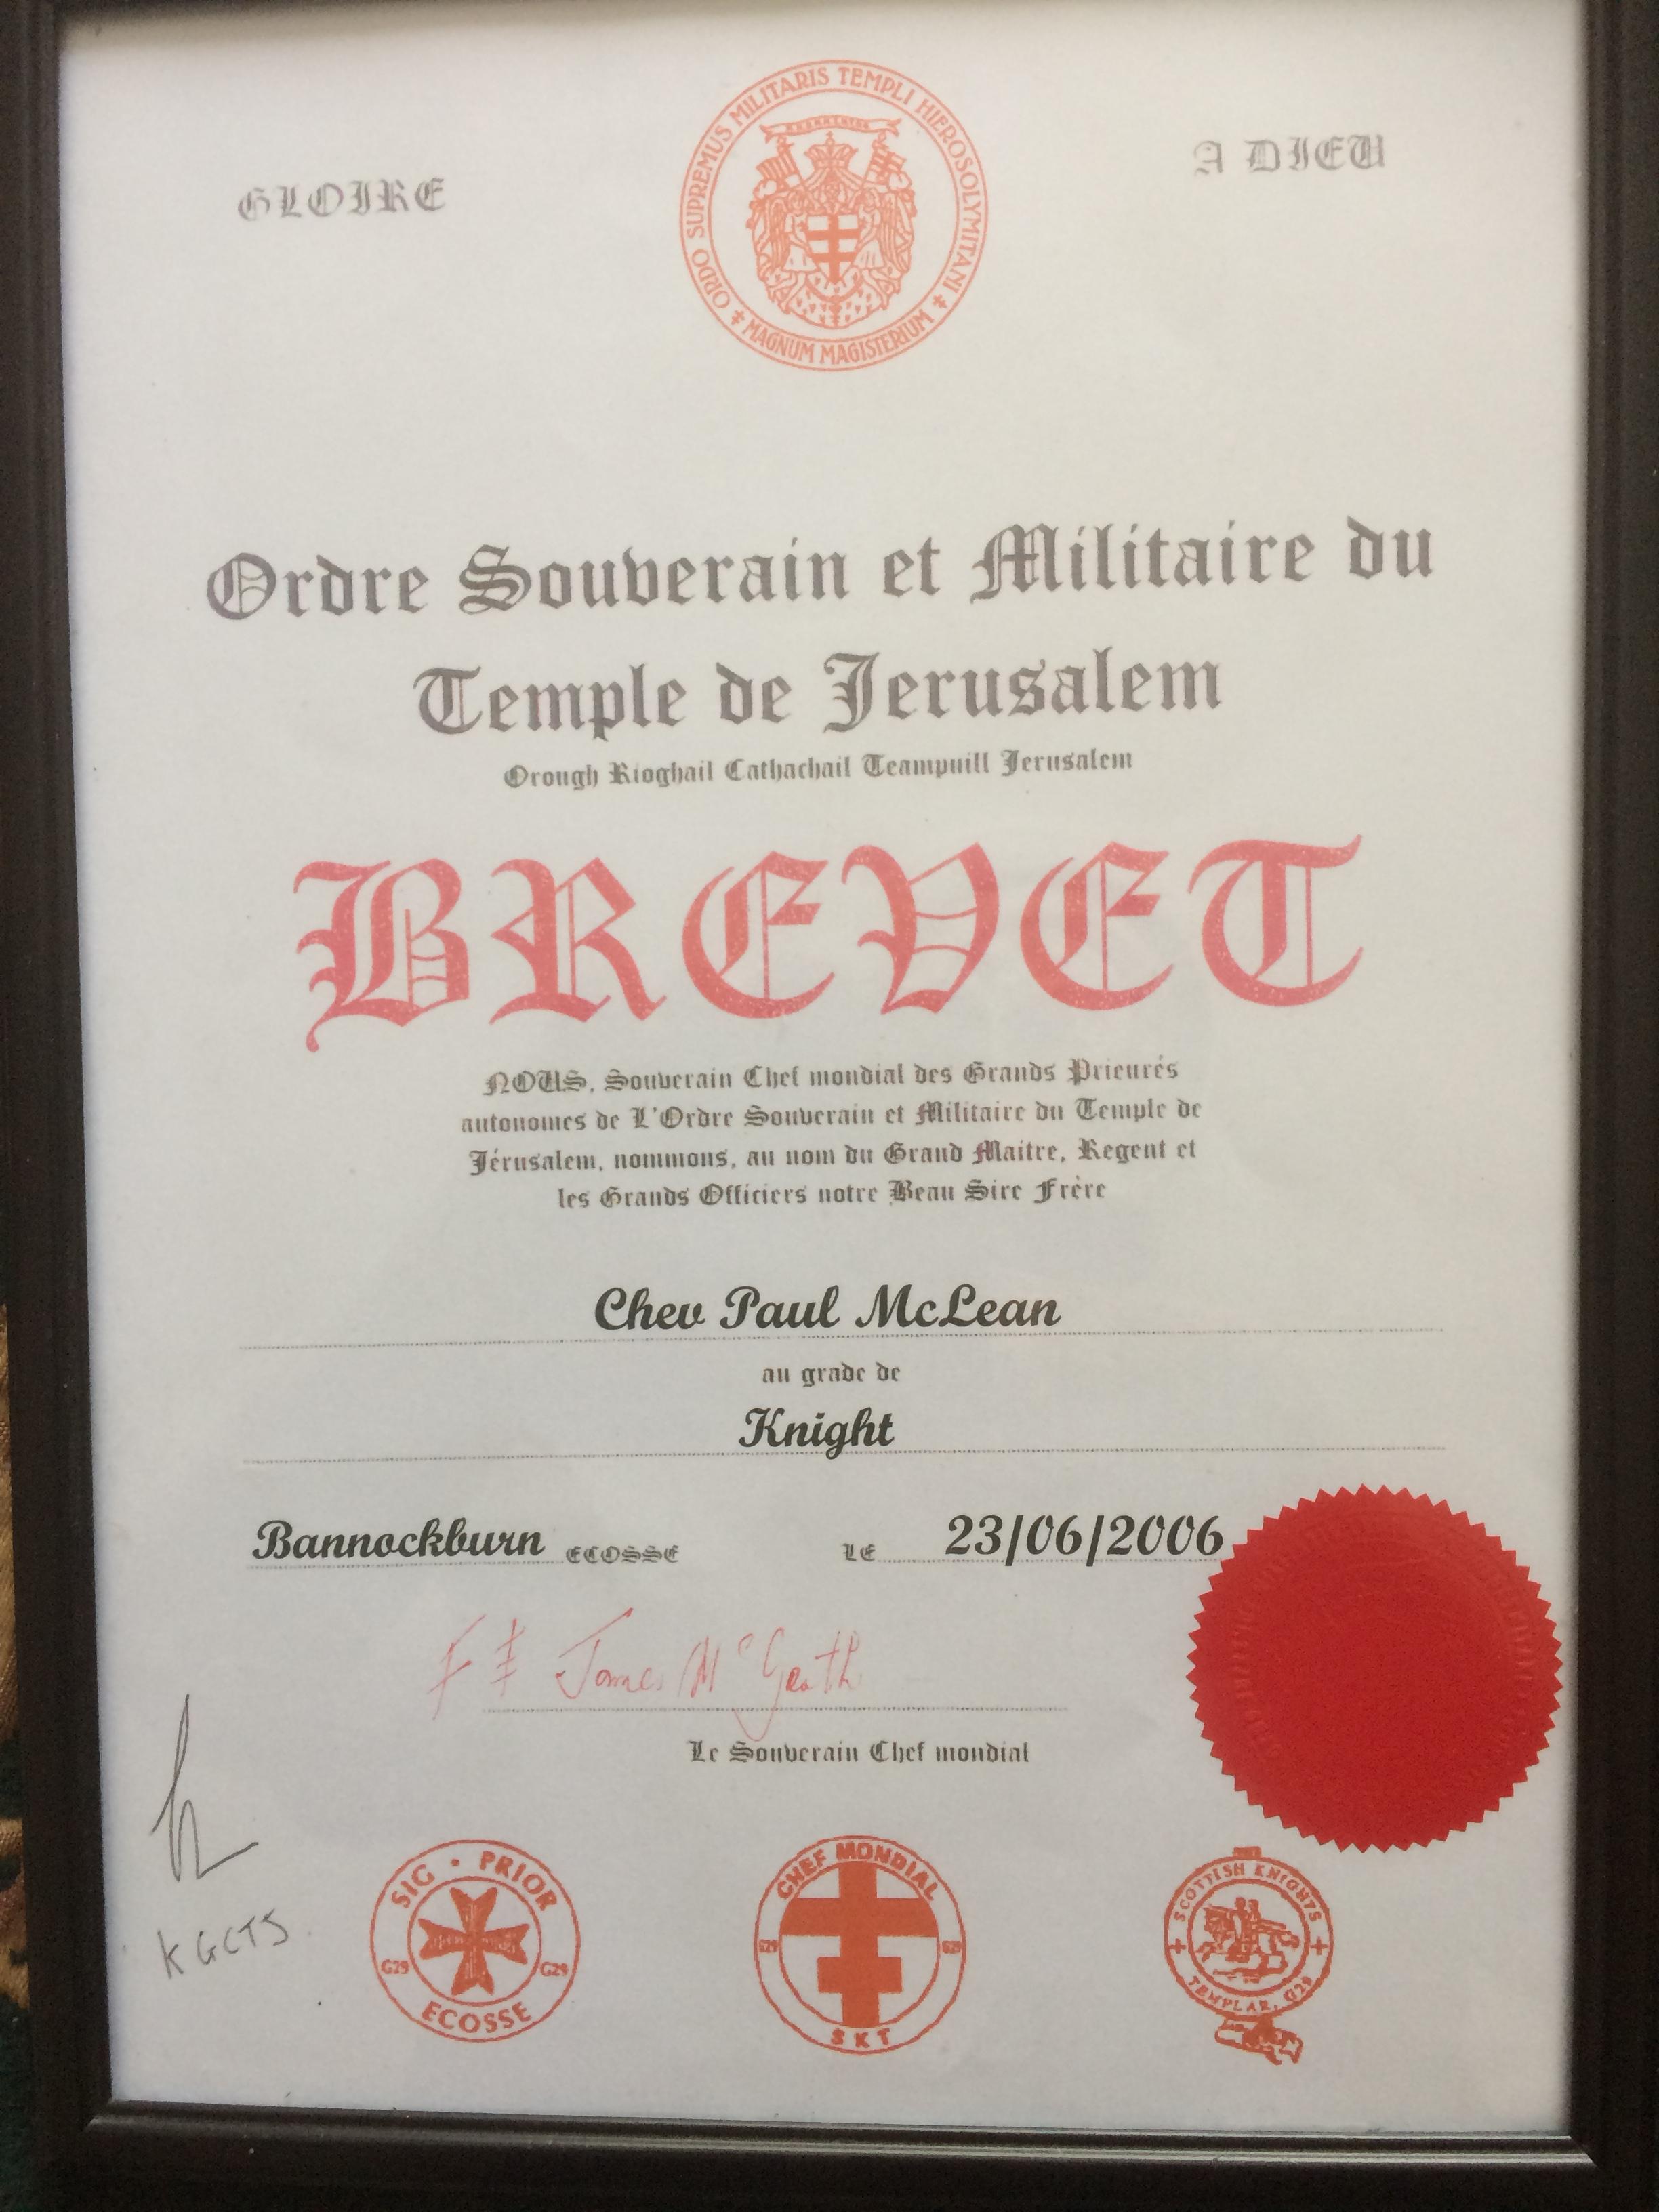 Certificate, Paul, Knights Templar, Bannockburn 2006 he became a Knight.